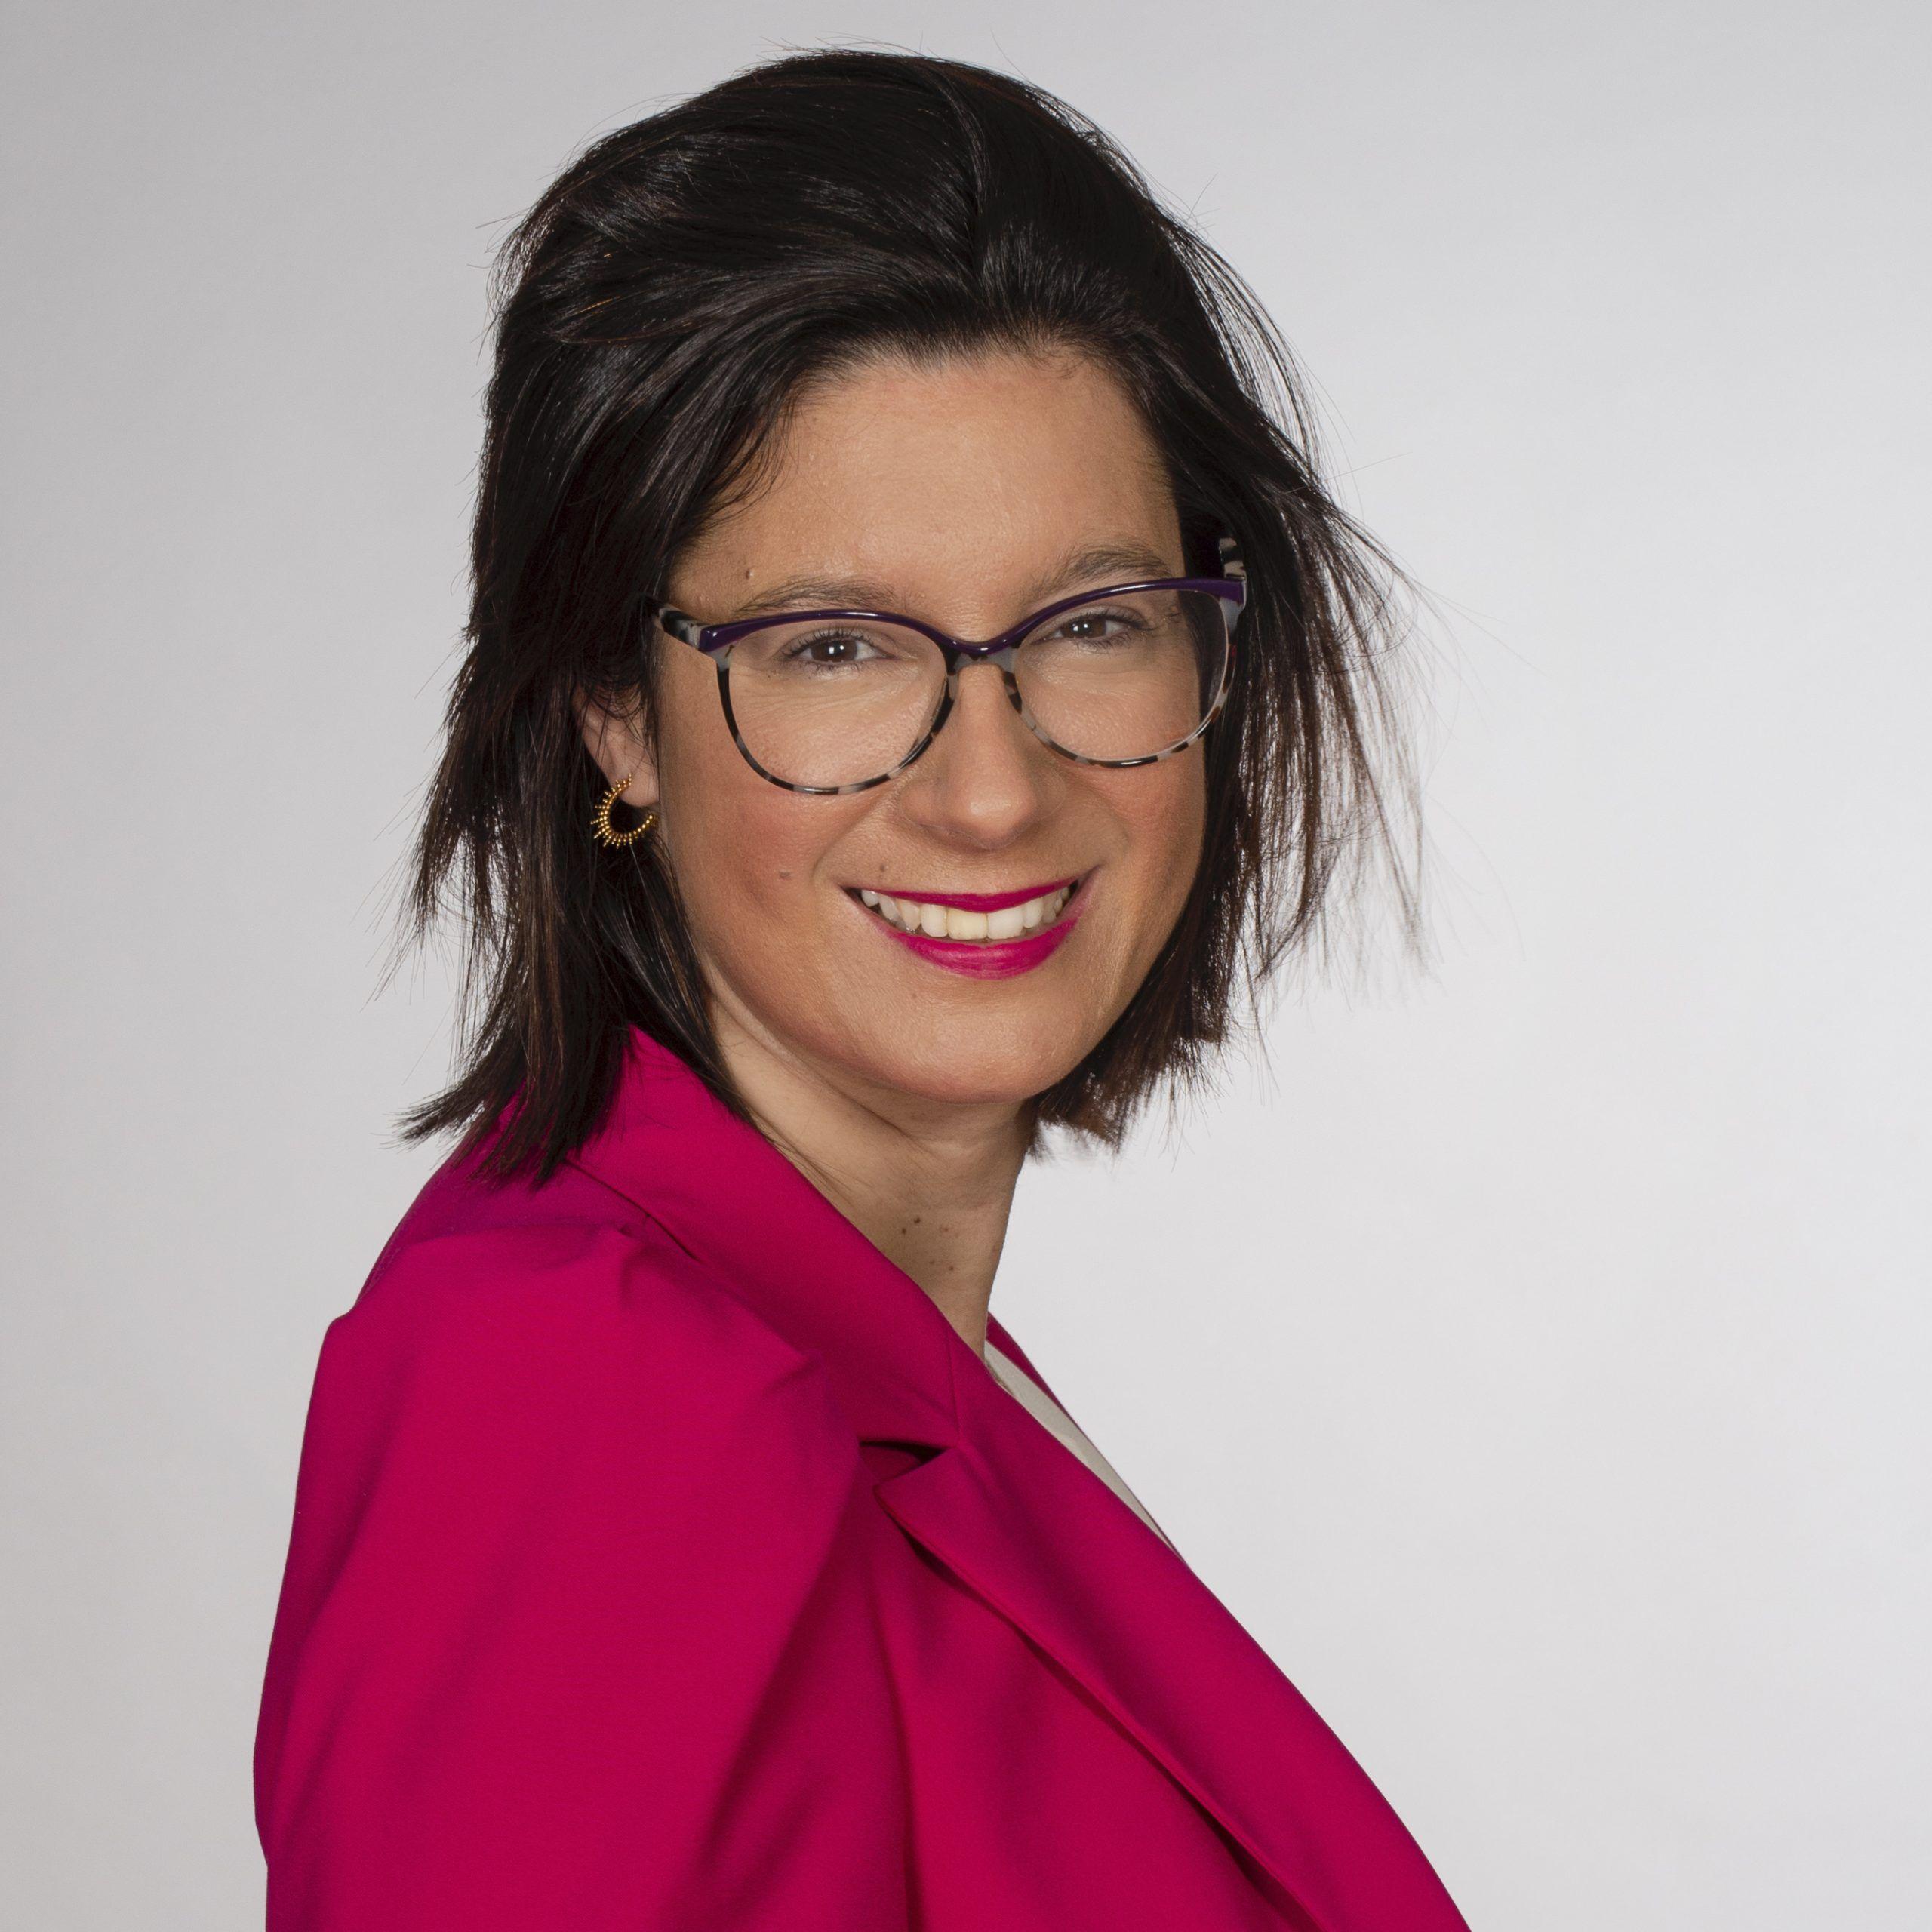 Margarita Ramos Topham